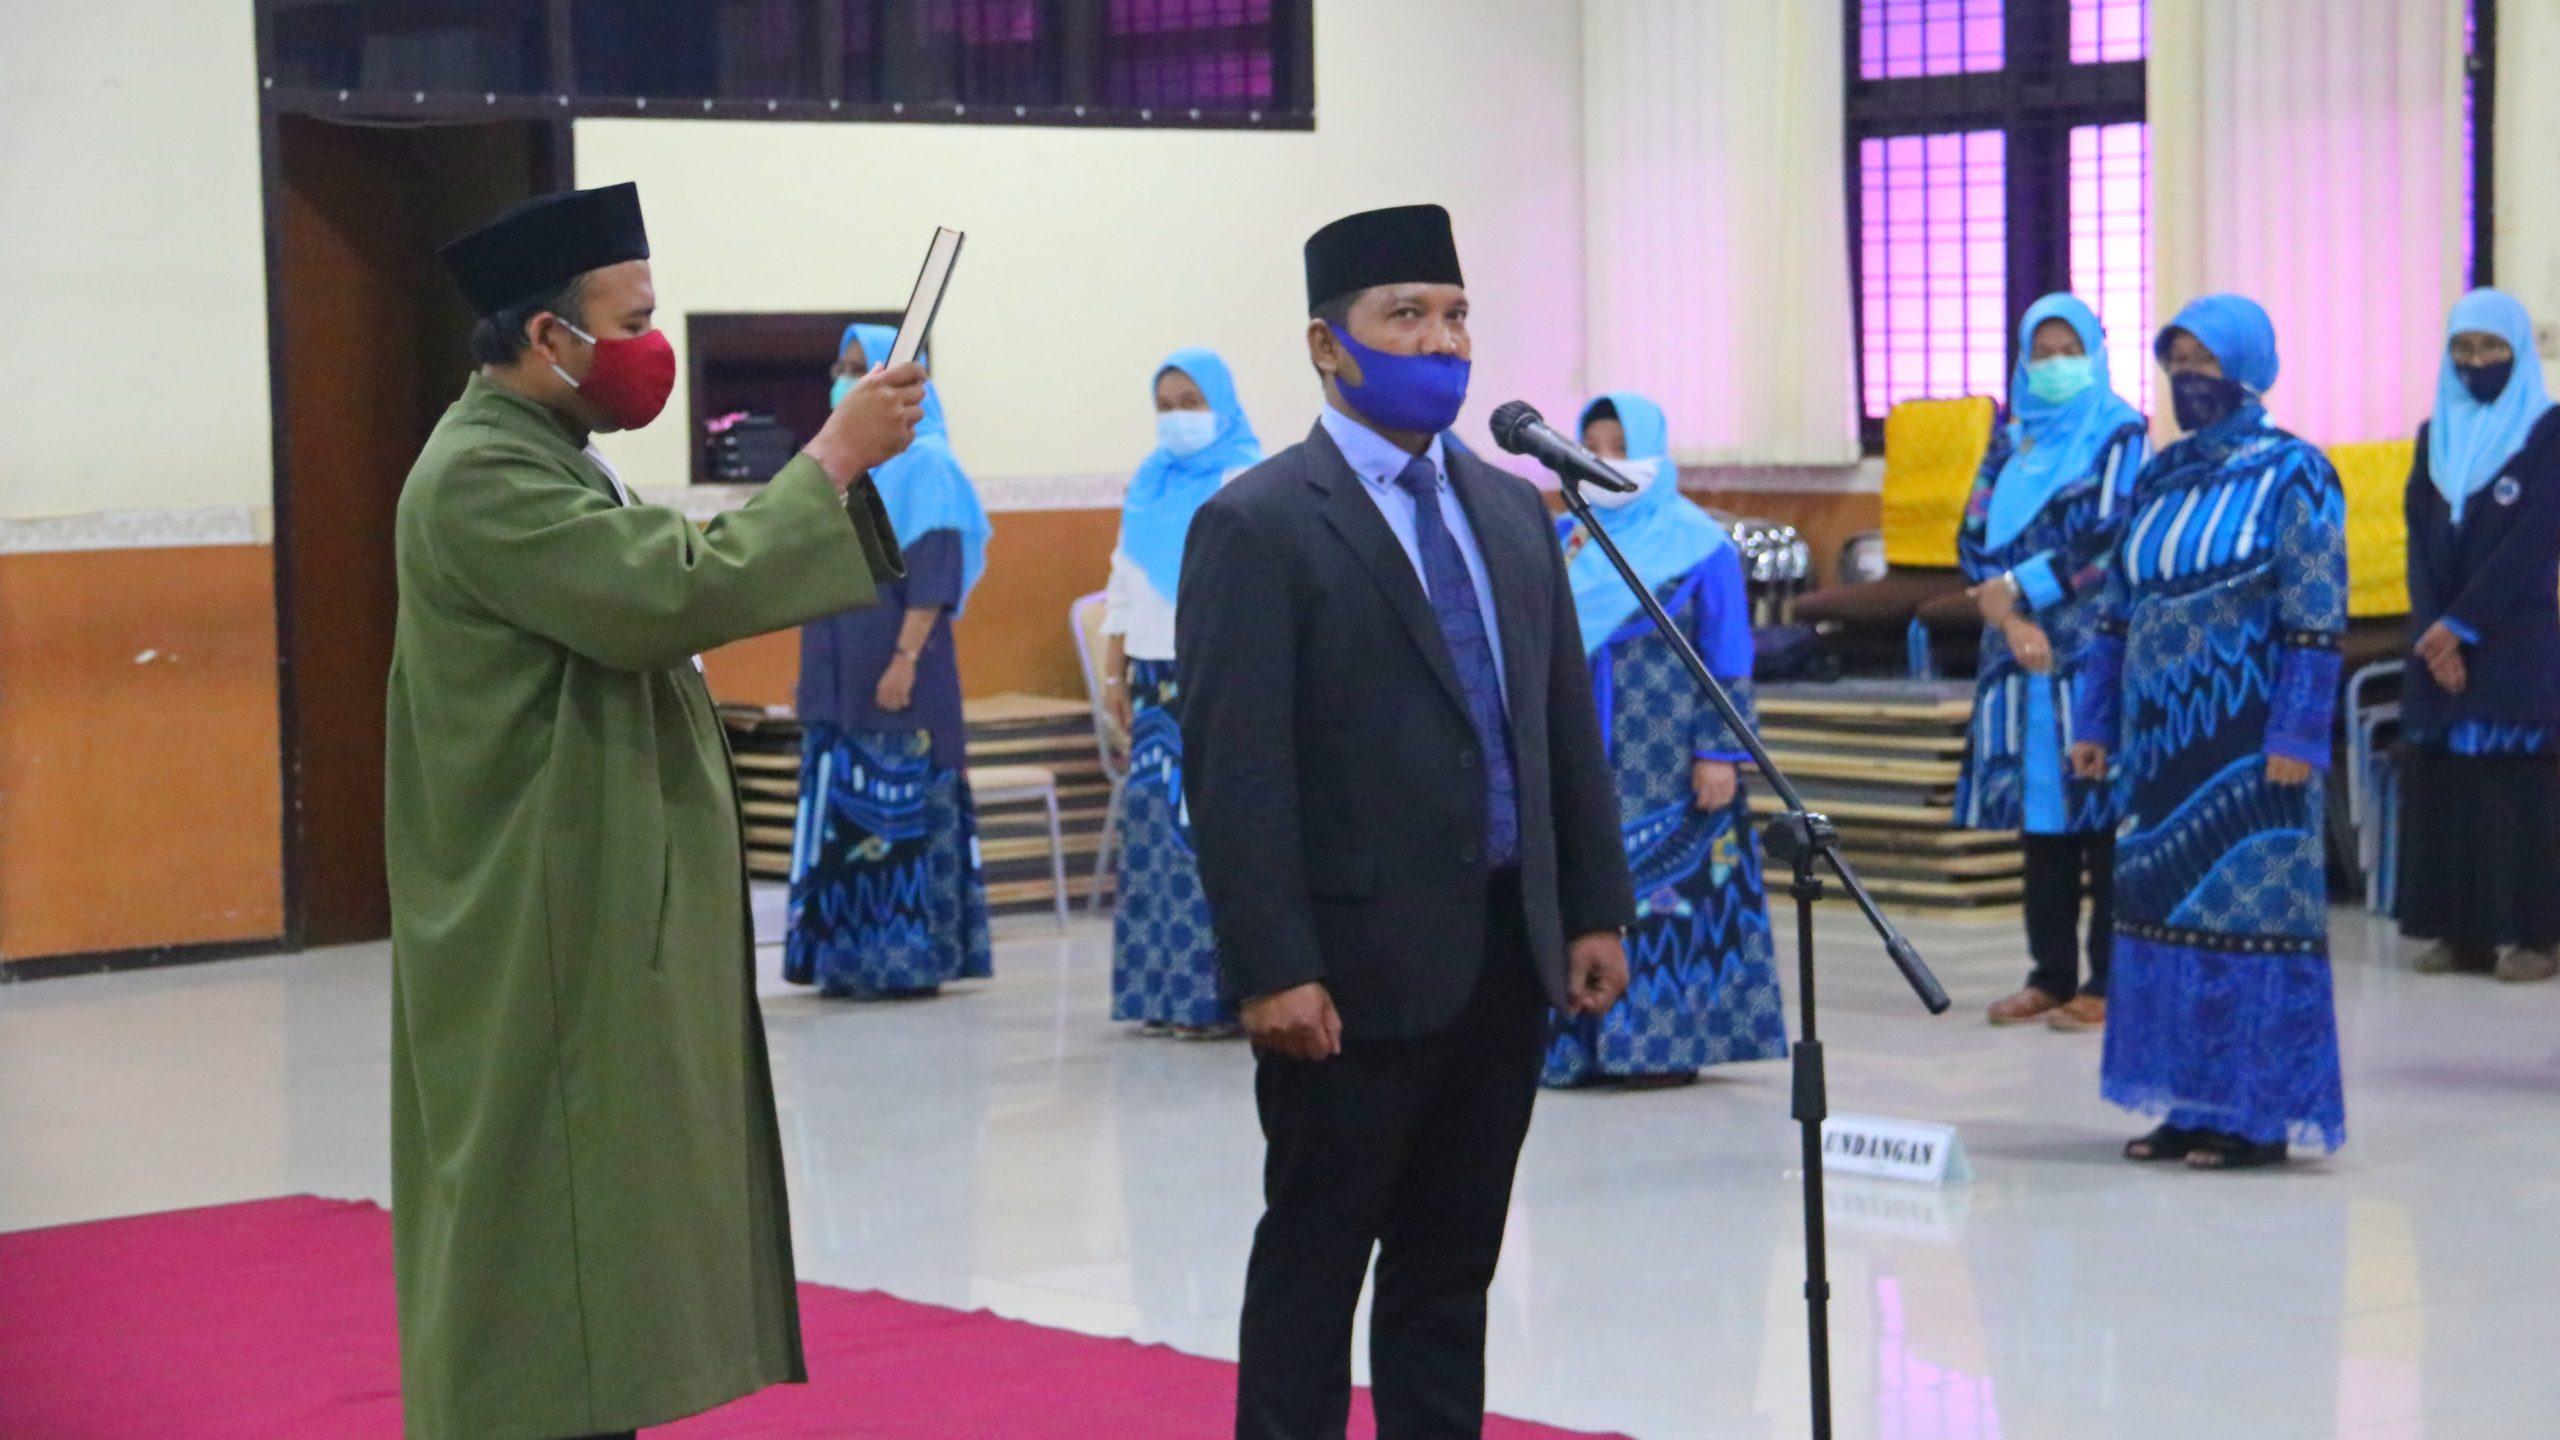 Photo of Dokumentasi Pelantikan Koorprodi S1 Bahasa dan Sastra Indonesia Jurusan Sastra Indonesia FS UM